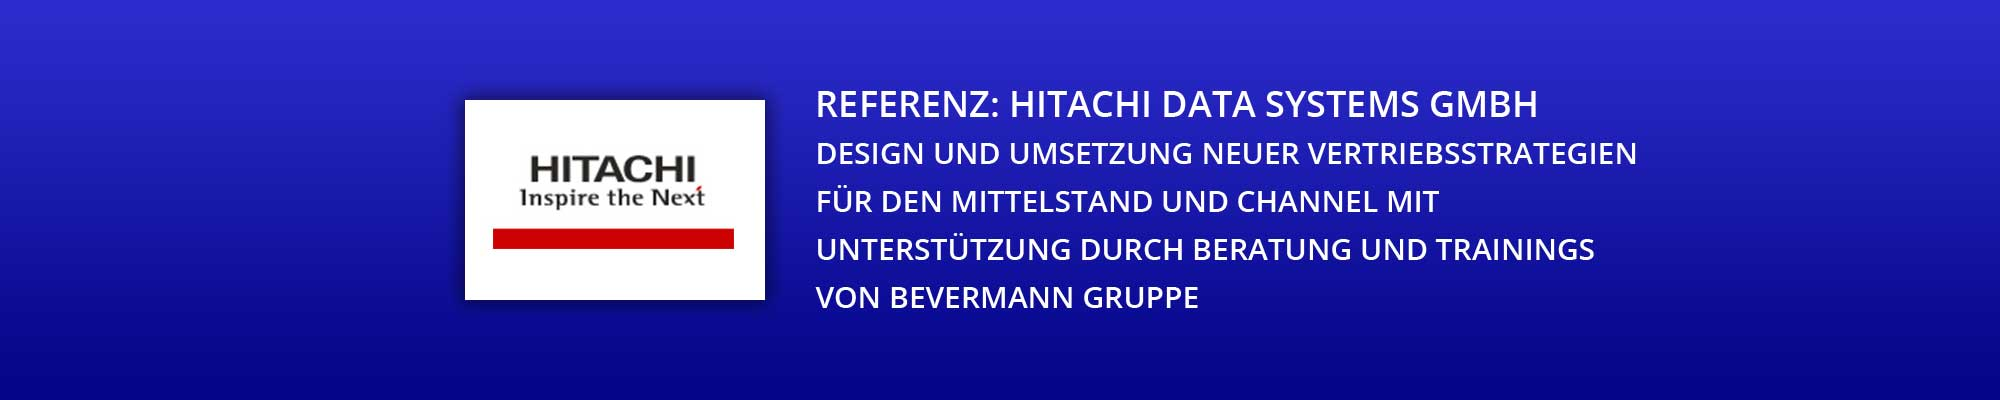 Hitachi-Data-Systems-GmbH